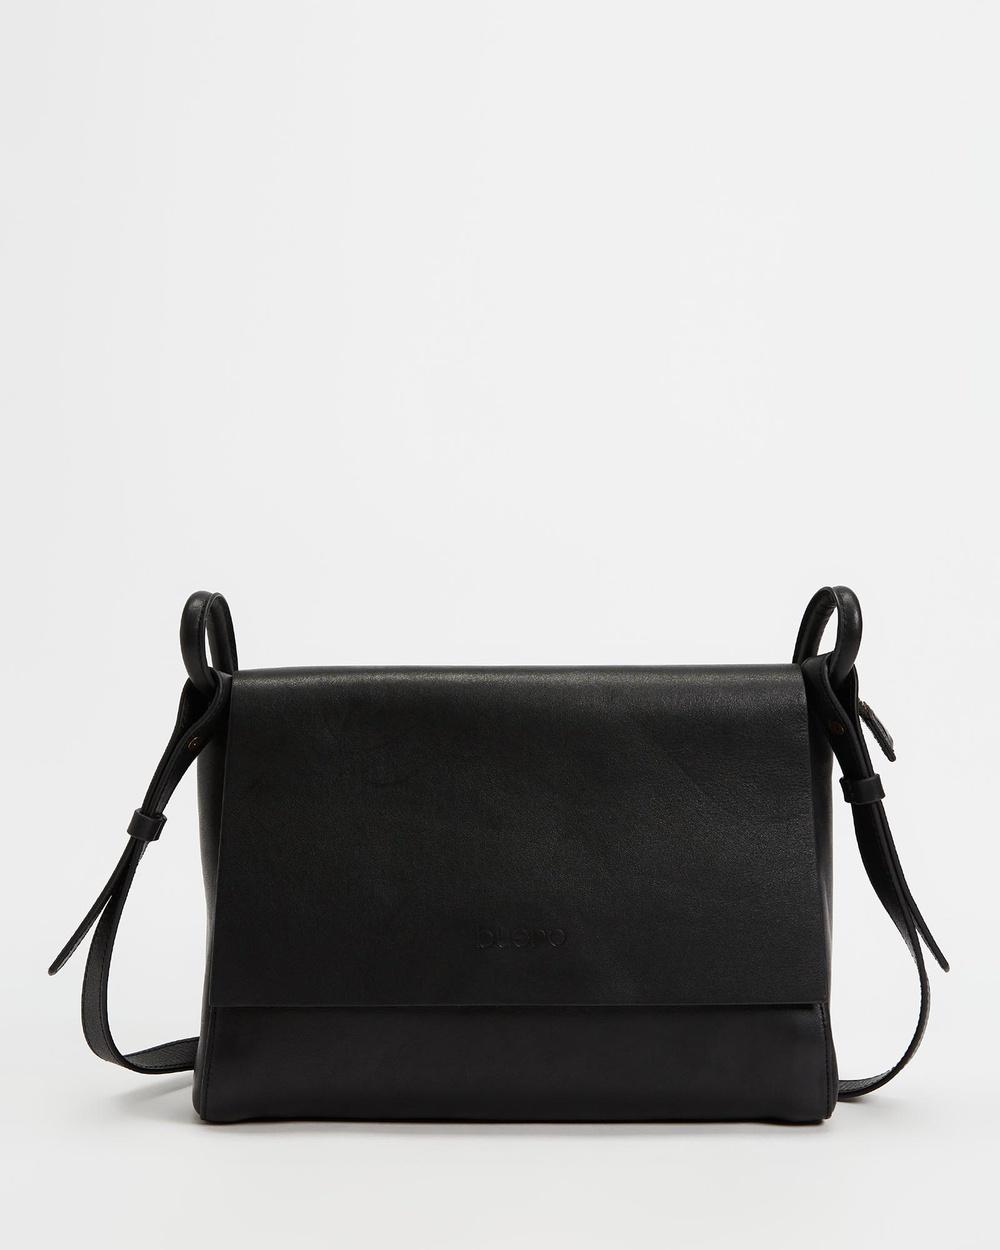 Bueno Delaney Handbags Black Handbags Australia